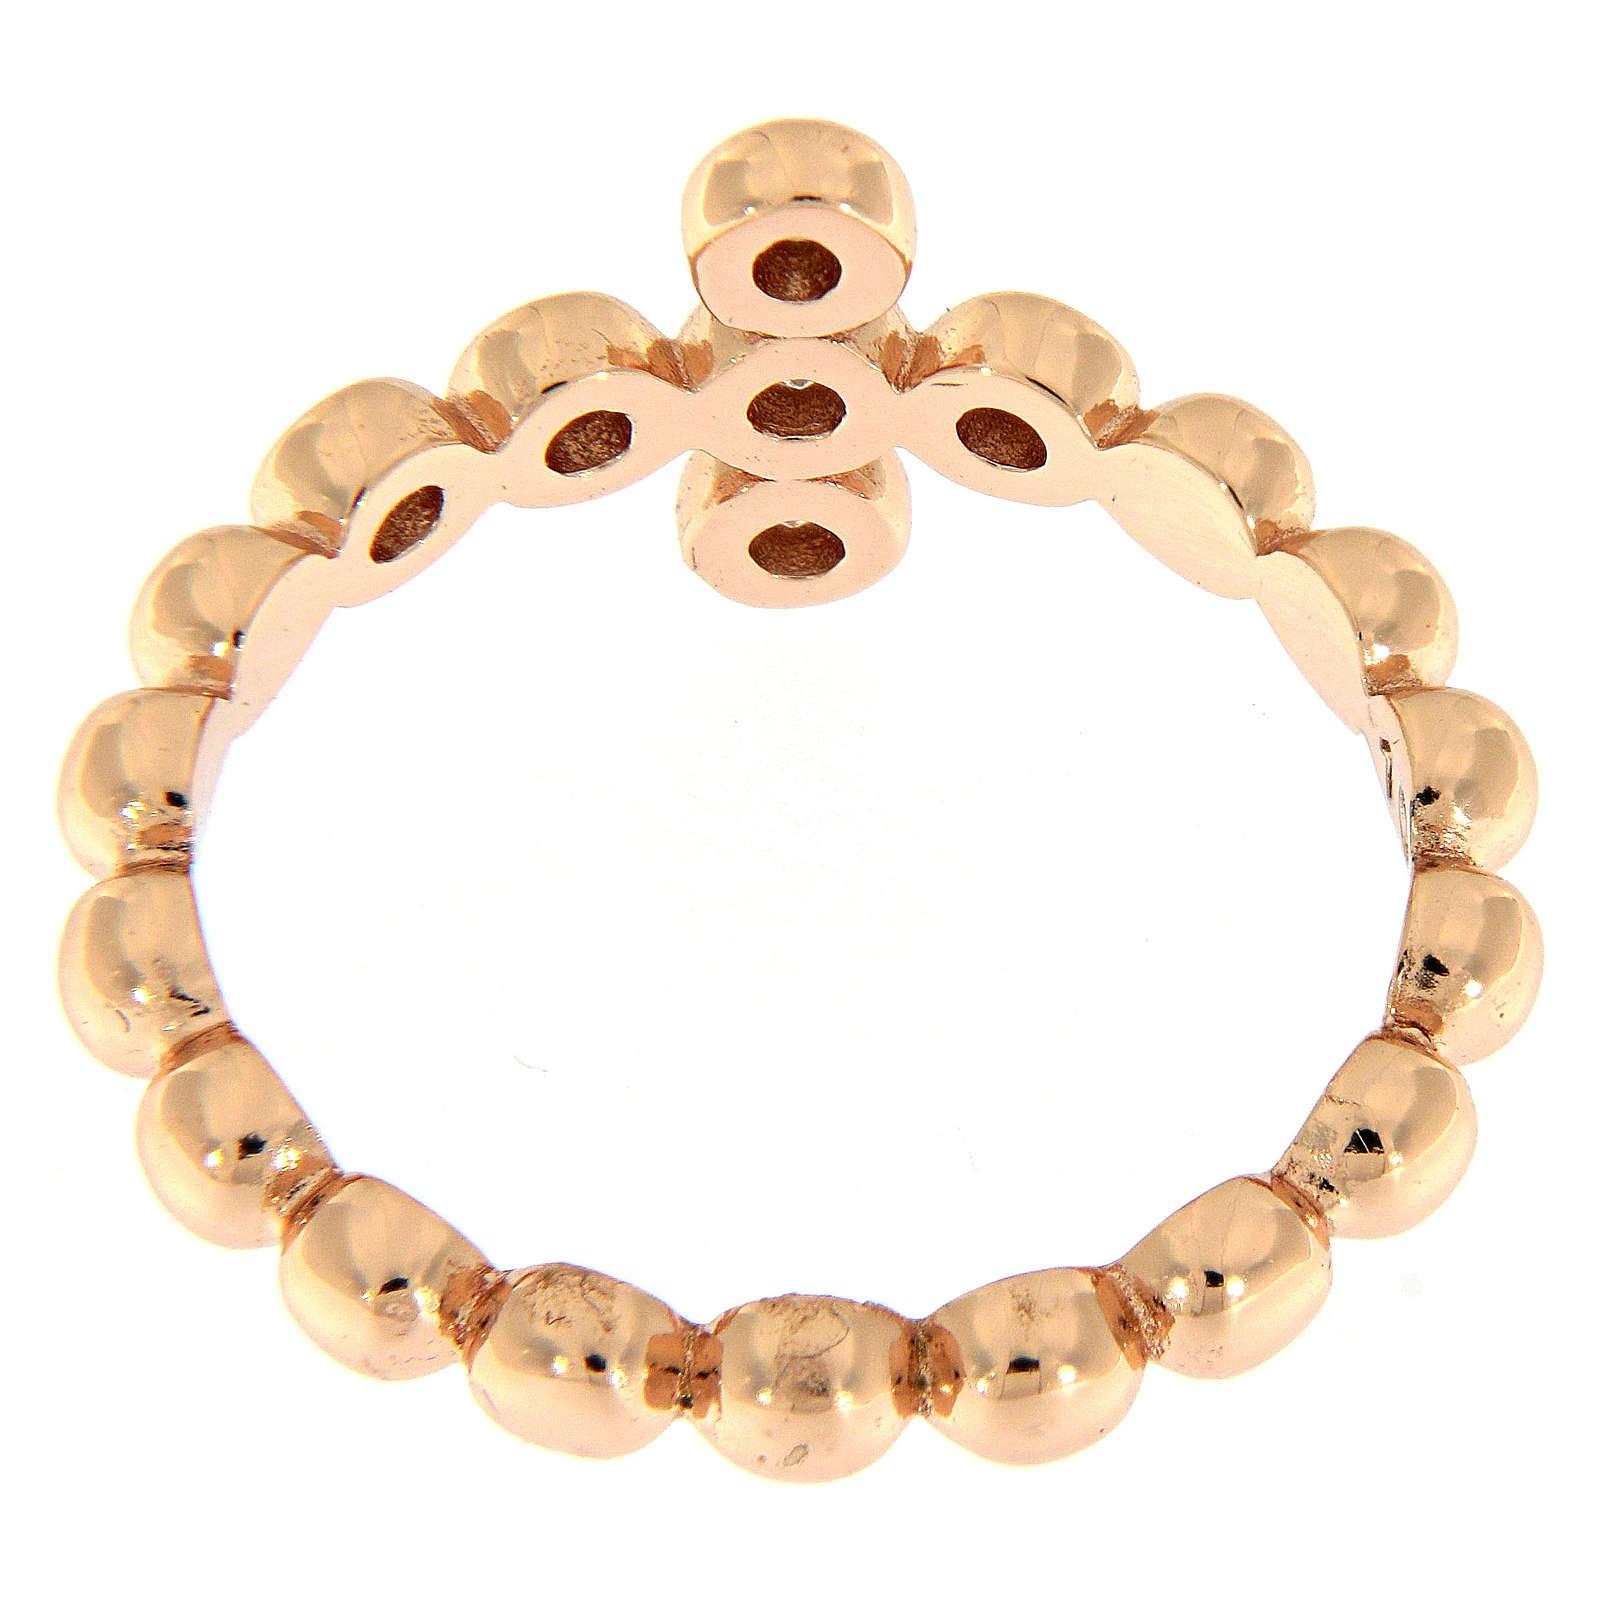 AMEN Beads Ring Rosè silver 925, white zircons 3